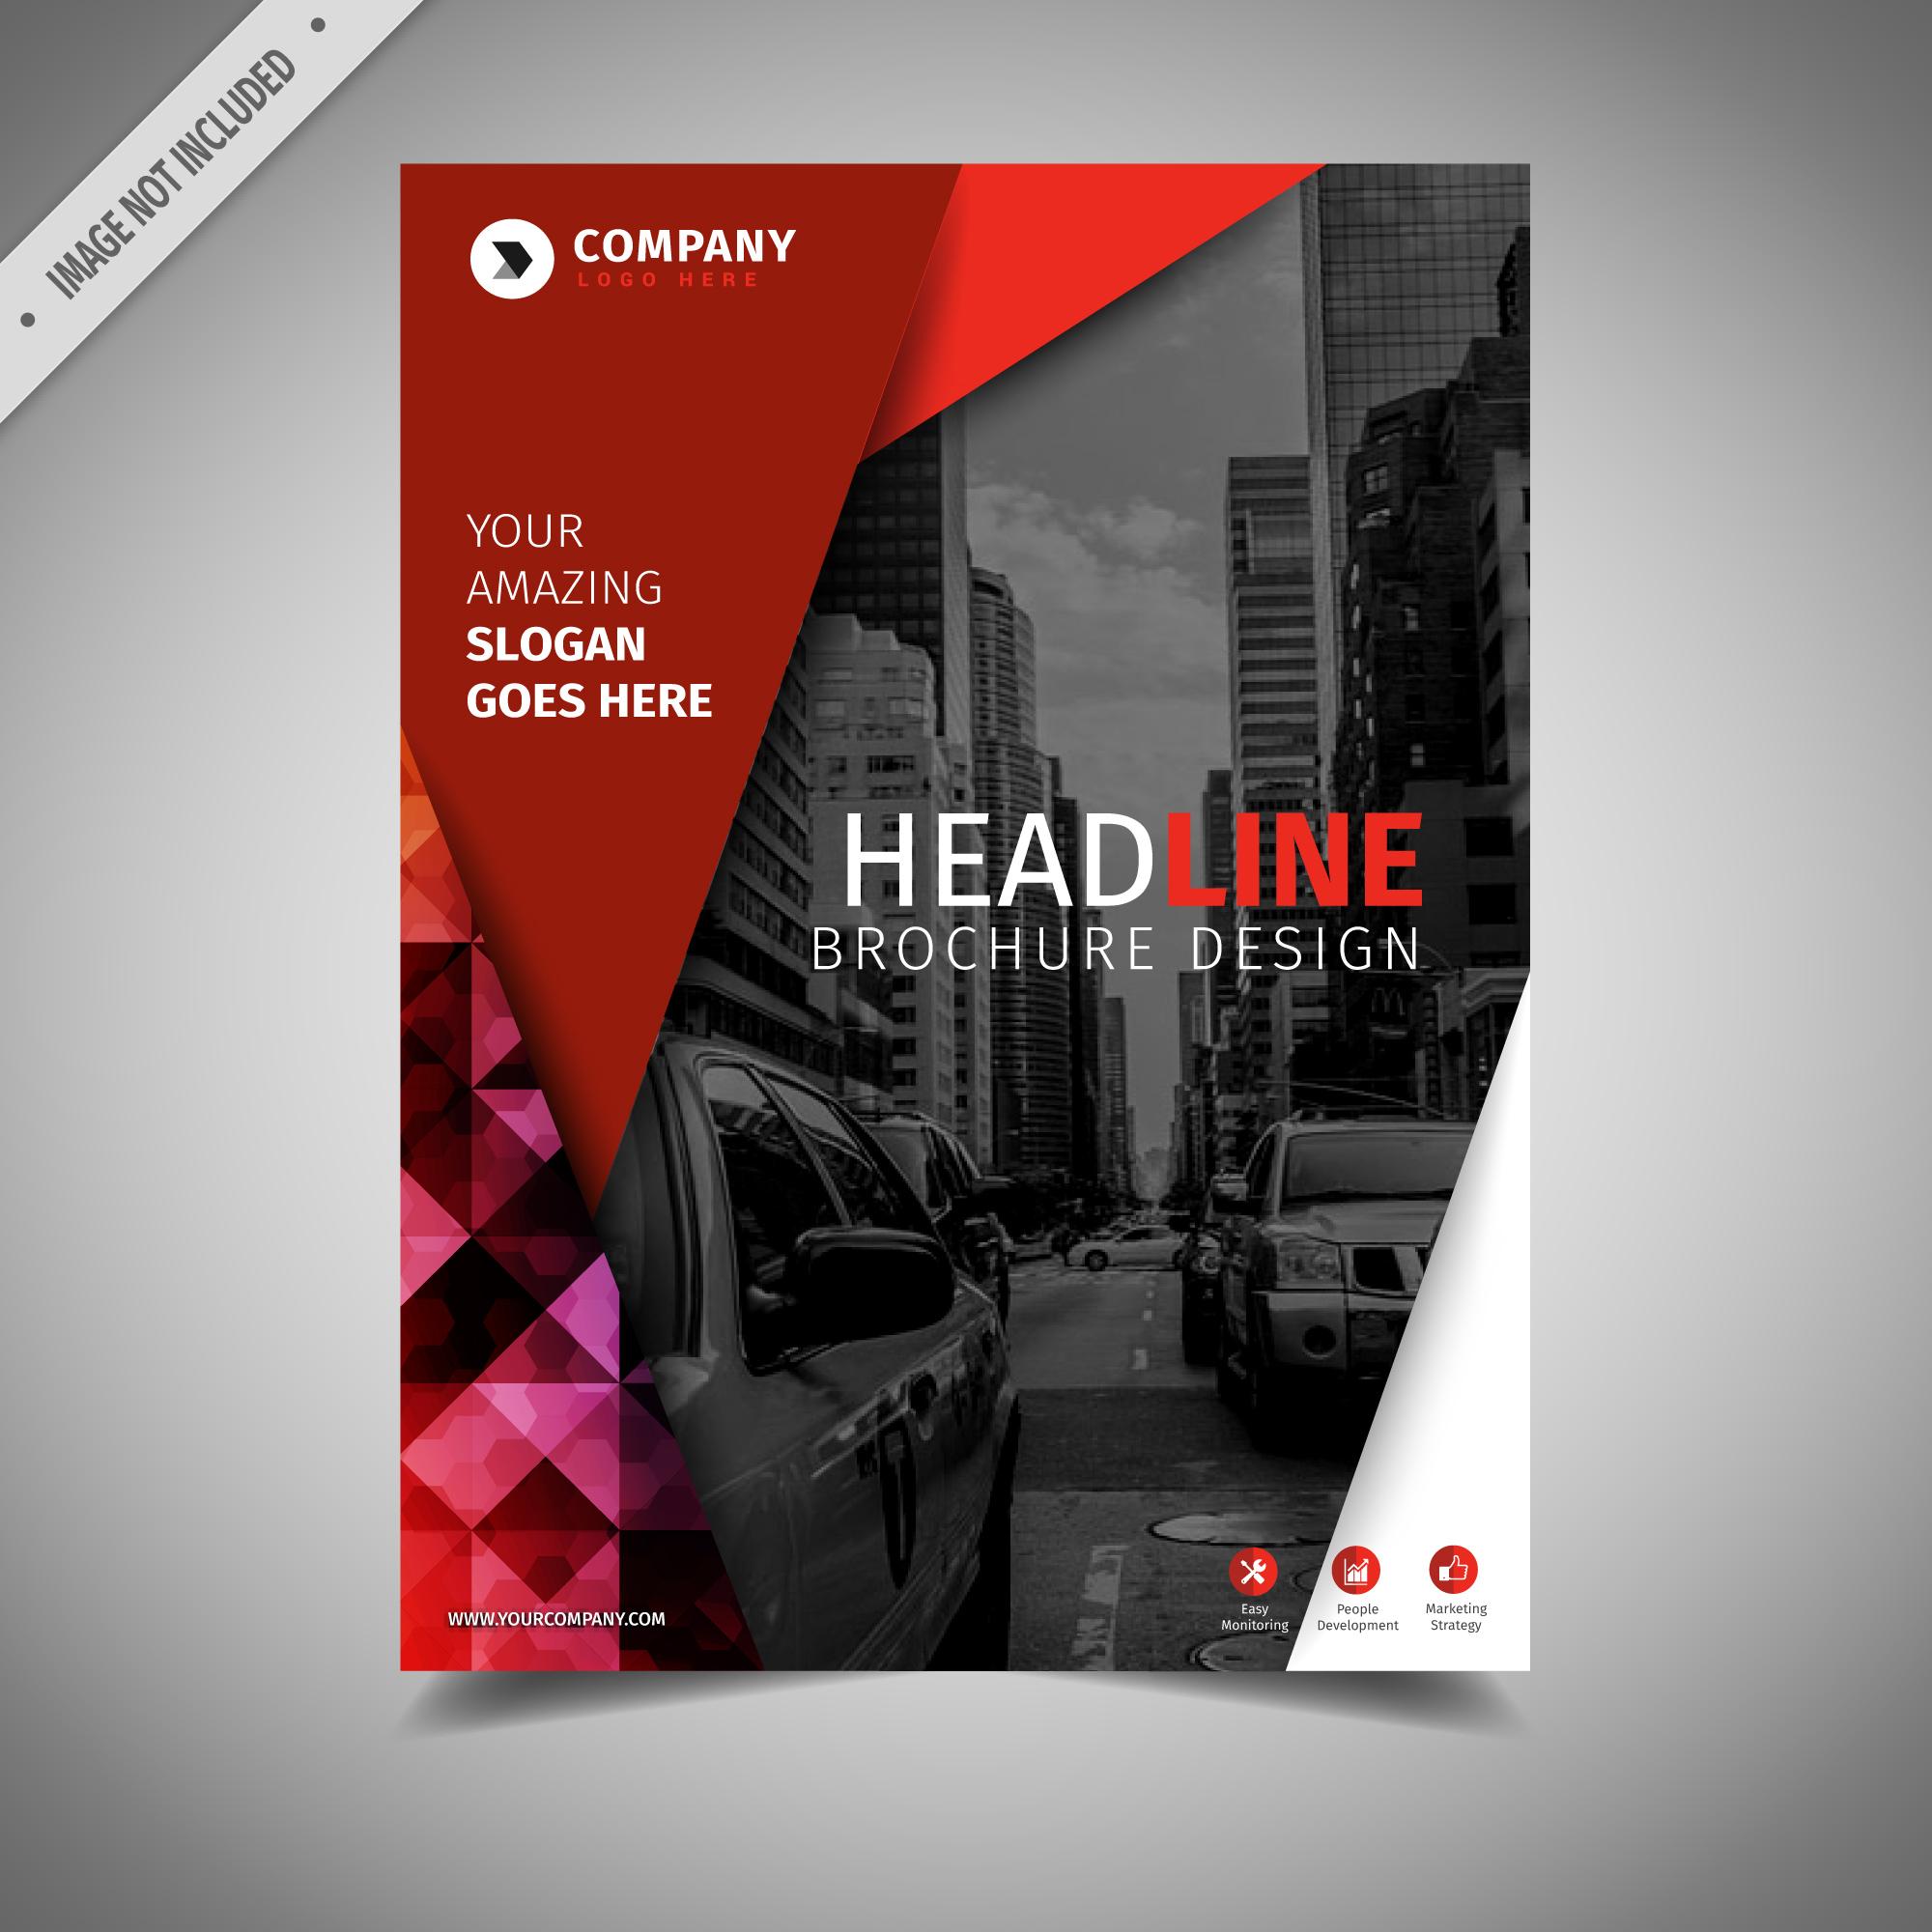 classy brochure design - red elegant brochure design download free vector art